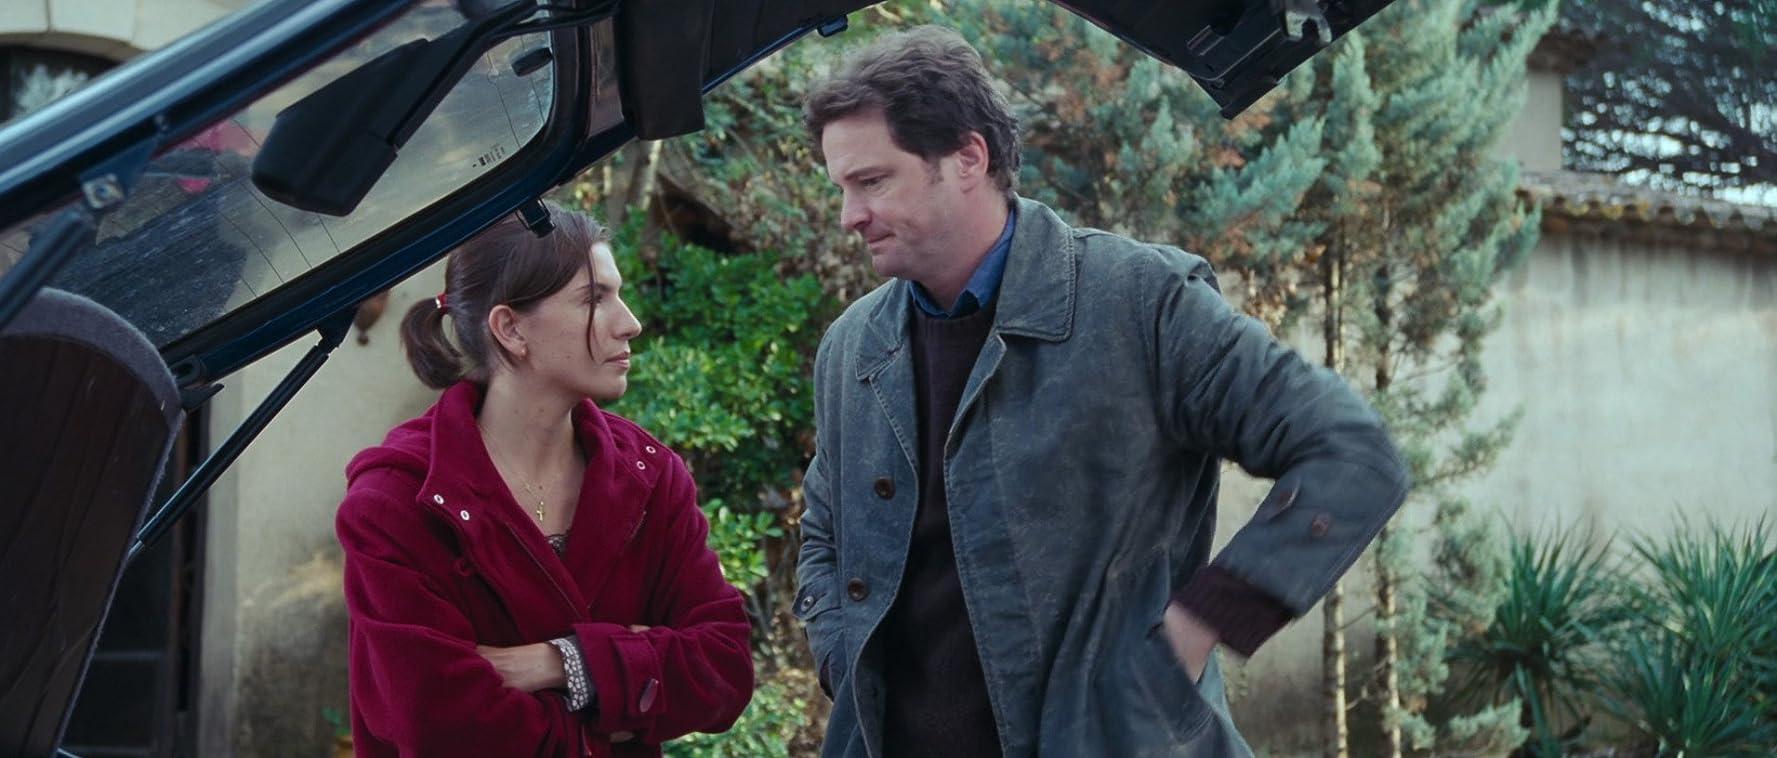 Colin Firth and Lúcia Moniz in Love Actually (2003)